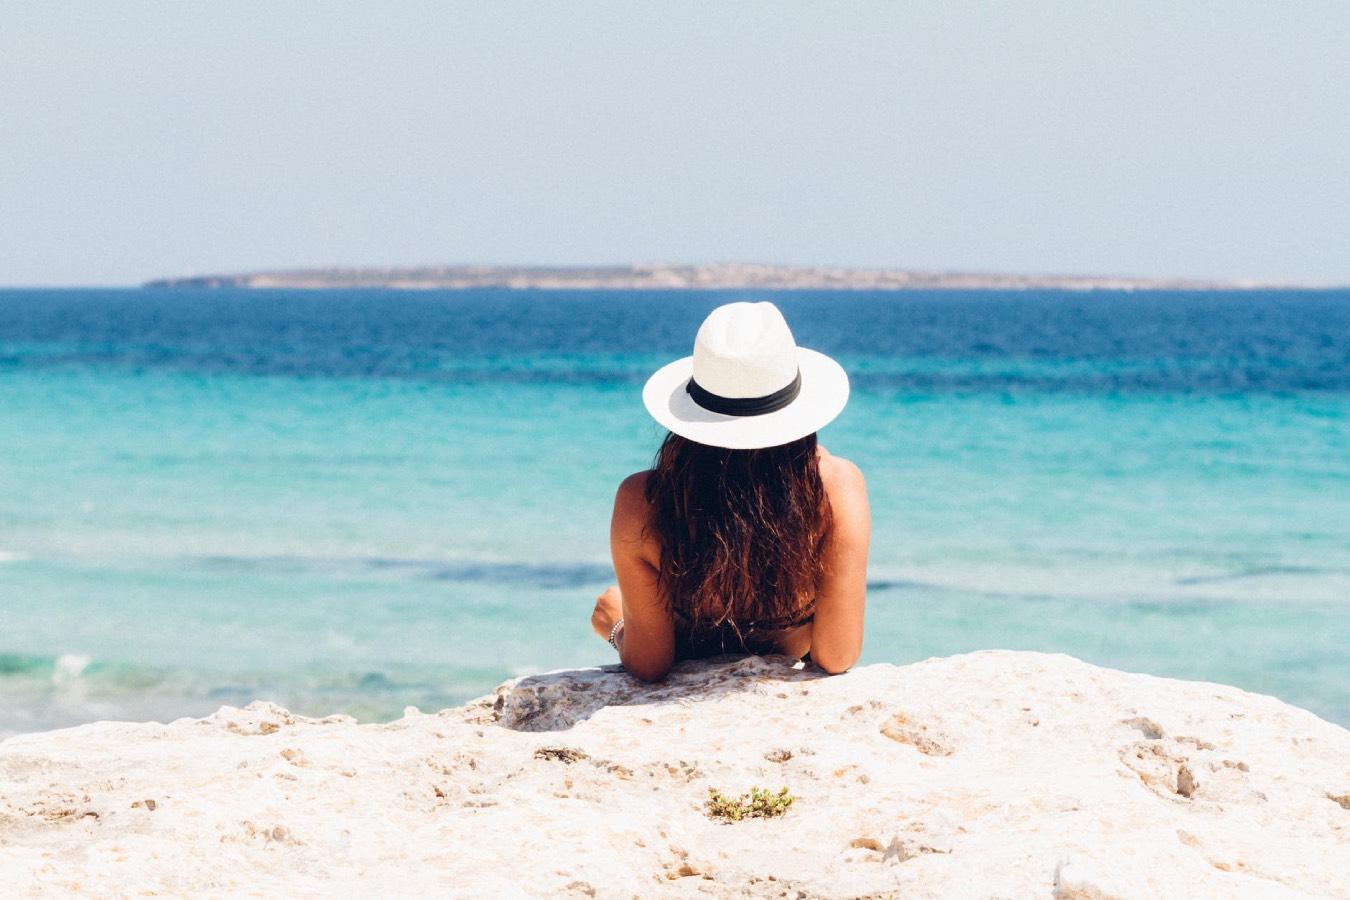 Playa de pexels